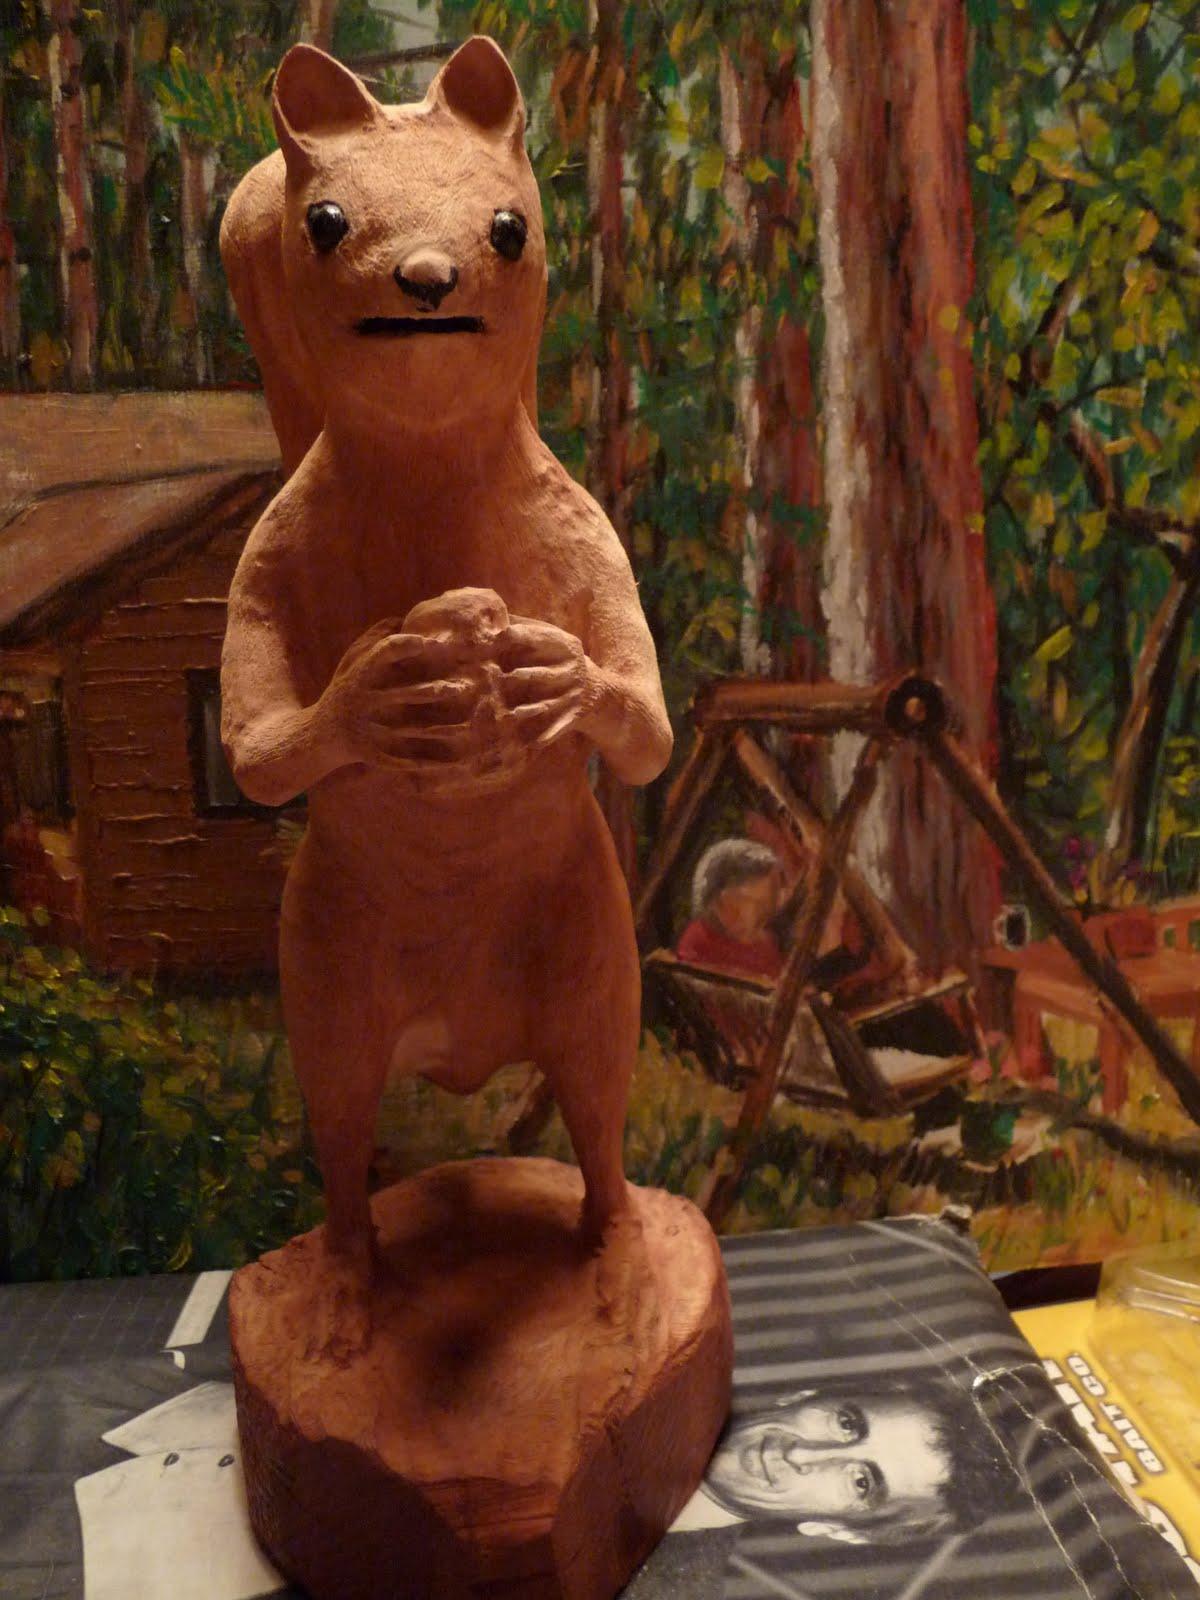 Faust Wurstkotzenhauser: Pro MemberBig Gay Squirrel ...